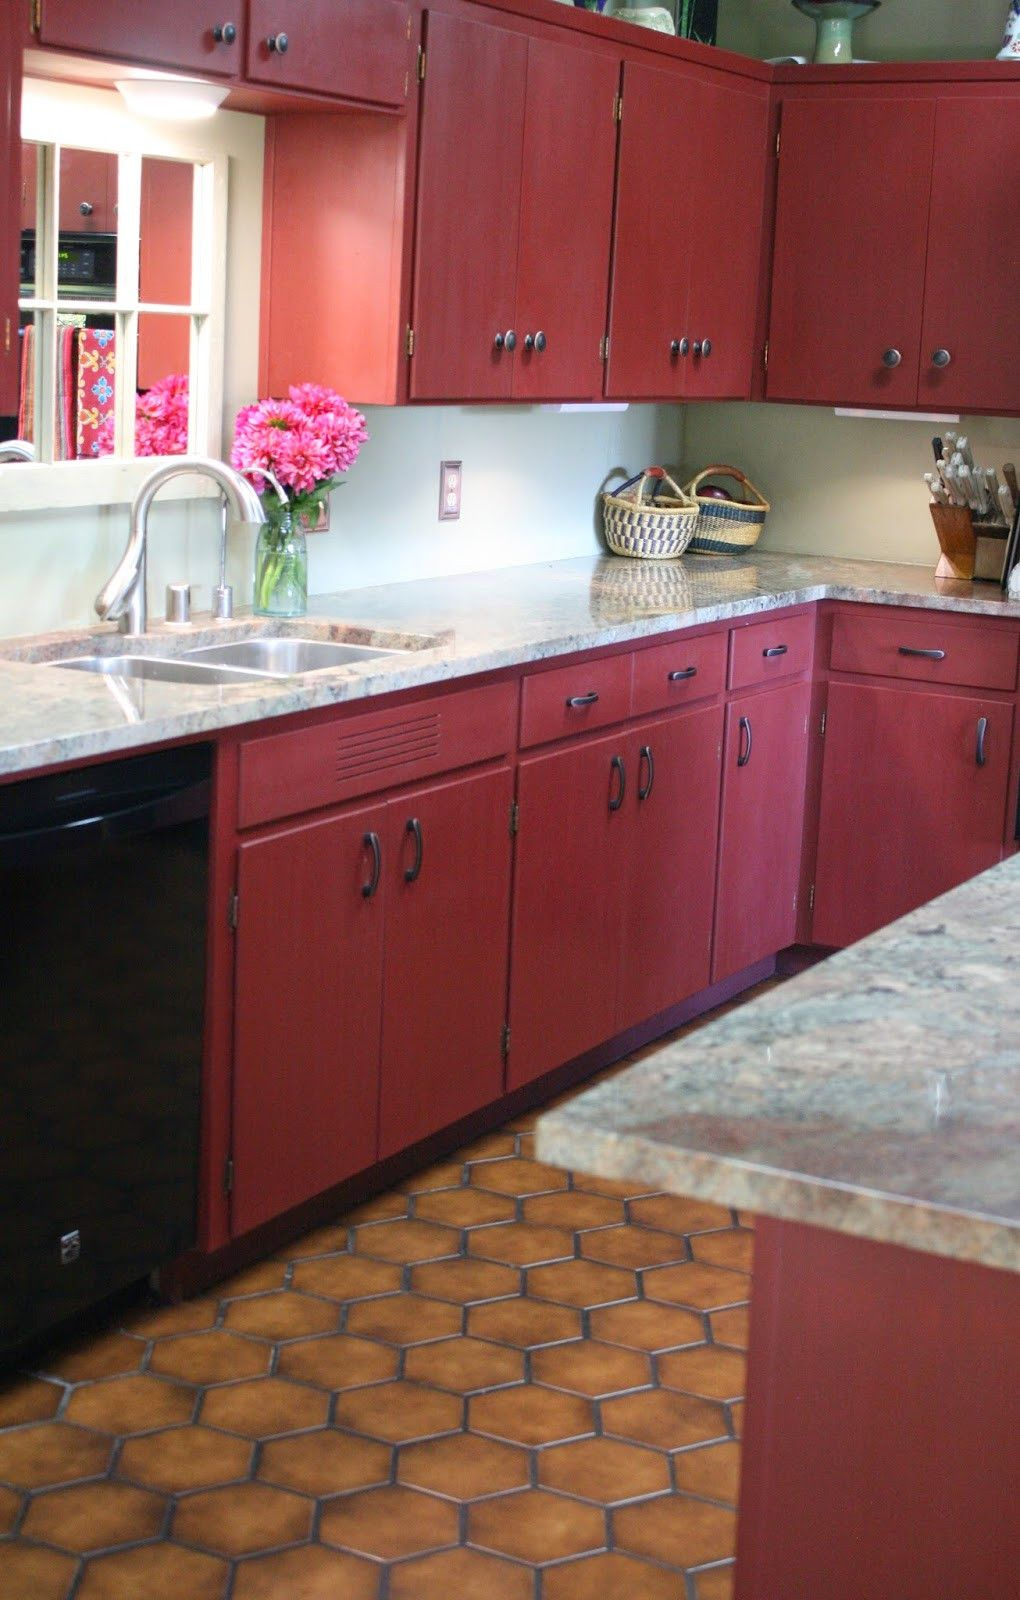 Reloved Rubbish Primer Red Chalk Paint Kitchen Cabinets In 2020 Chalk Paint Kitchen Cabinets Chalk Paint Kitchen Red Kitchen Cabinets